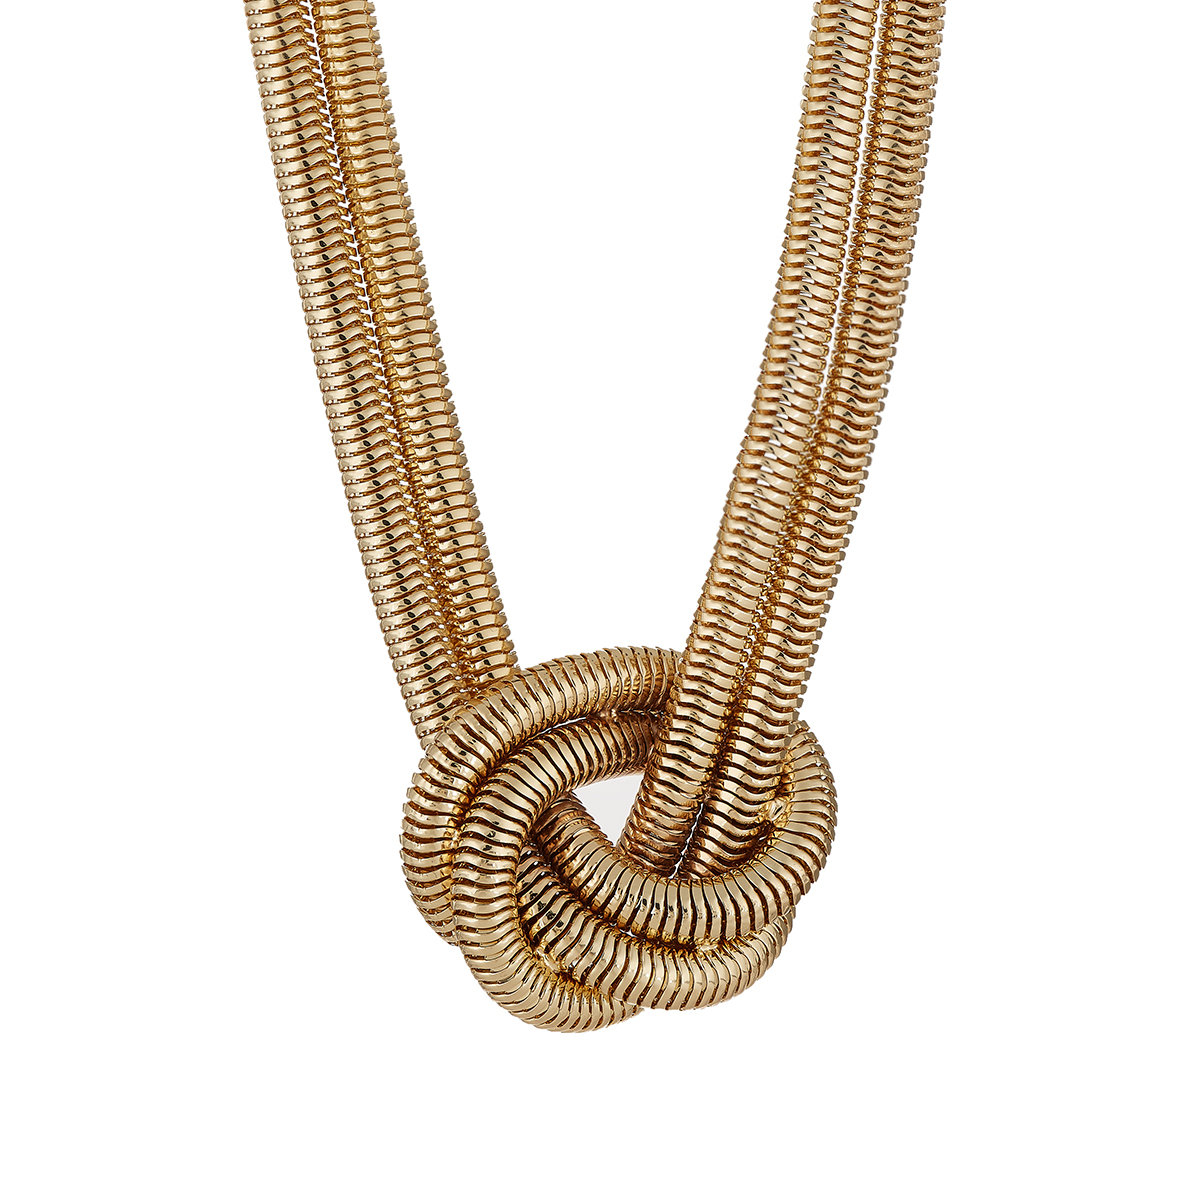 Para Mujer Multi-hilo Collar De Cadena Serpiente Kenneth Jay Lane jkek2Q6D